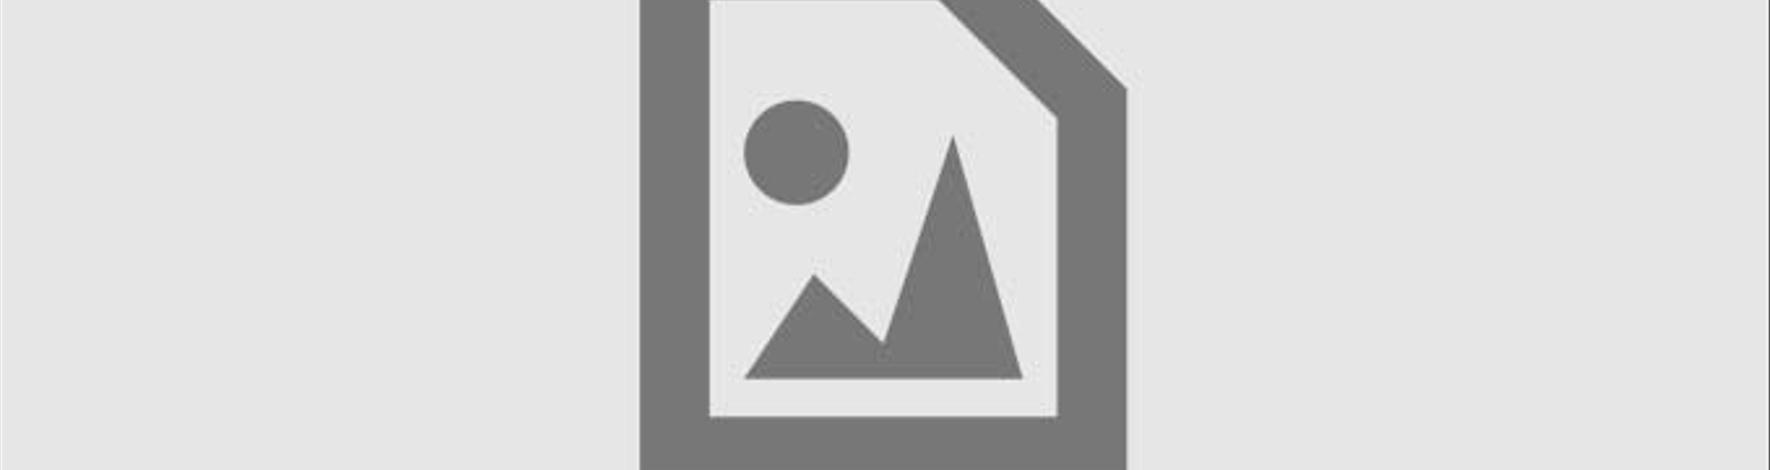 "Electrizante primer trailer de ""Madre!"" de Darren Aronofsky"